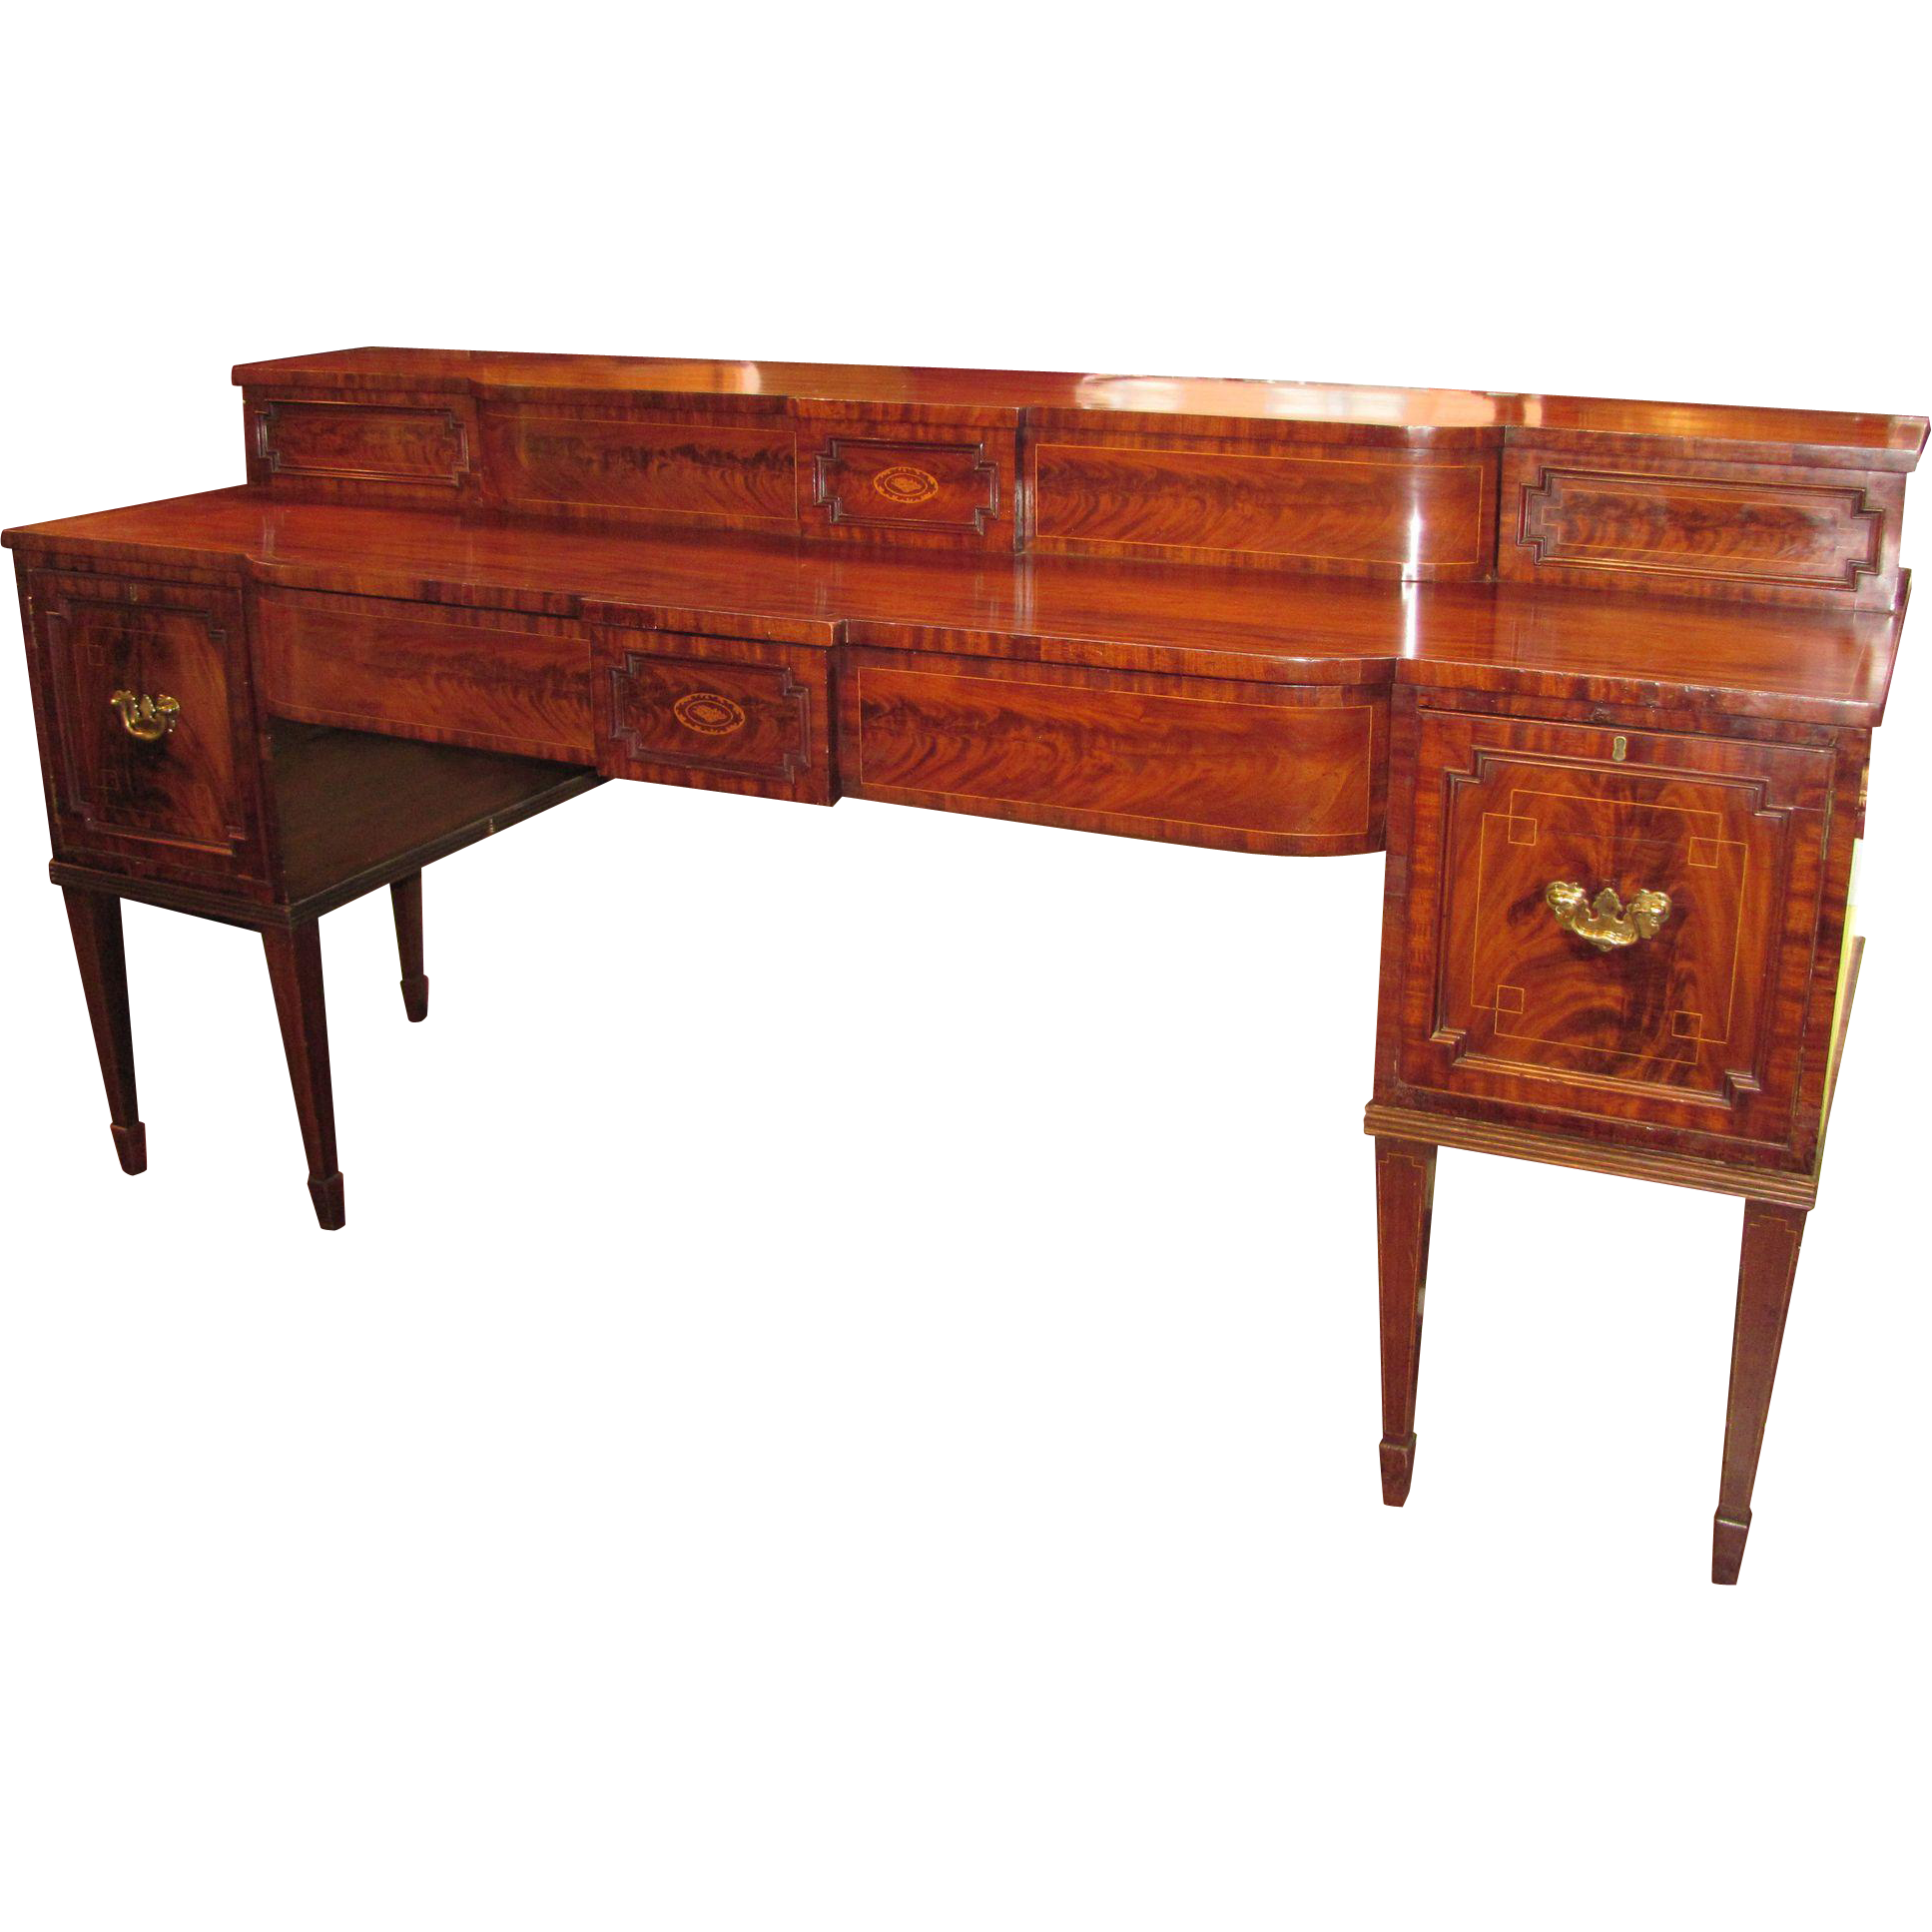 Antique English Georgian Mahogany Sideboard Circa 1815